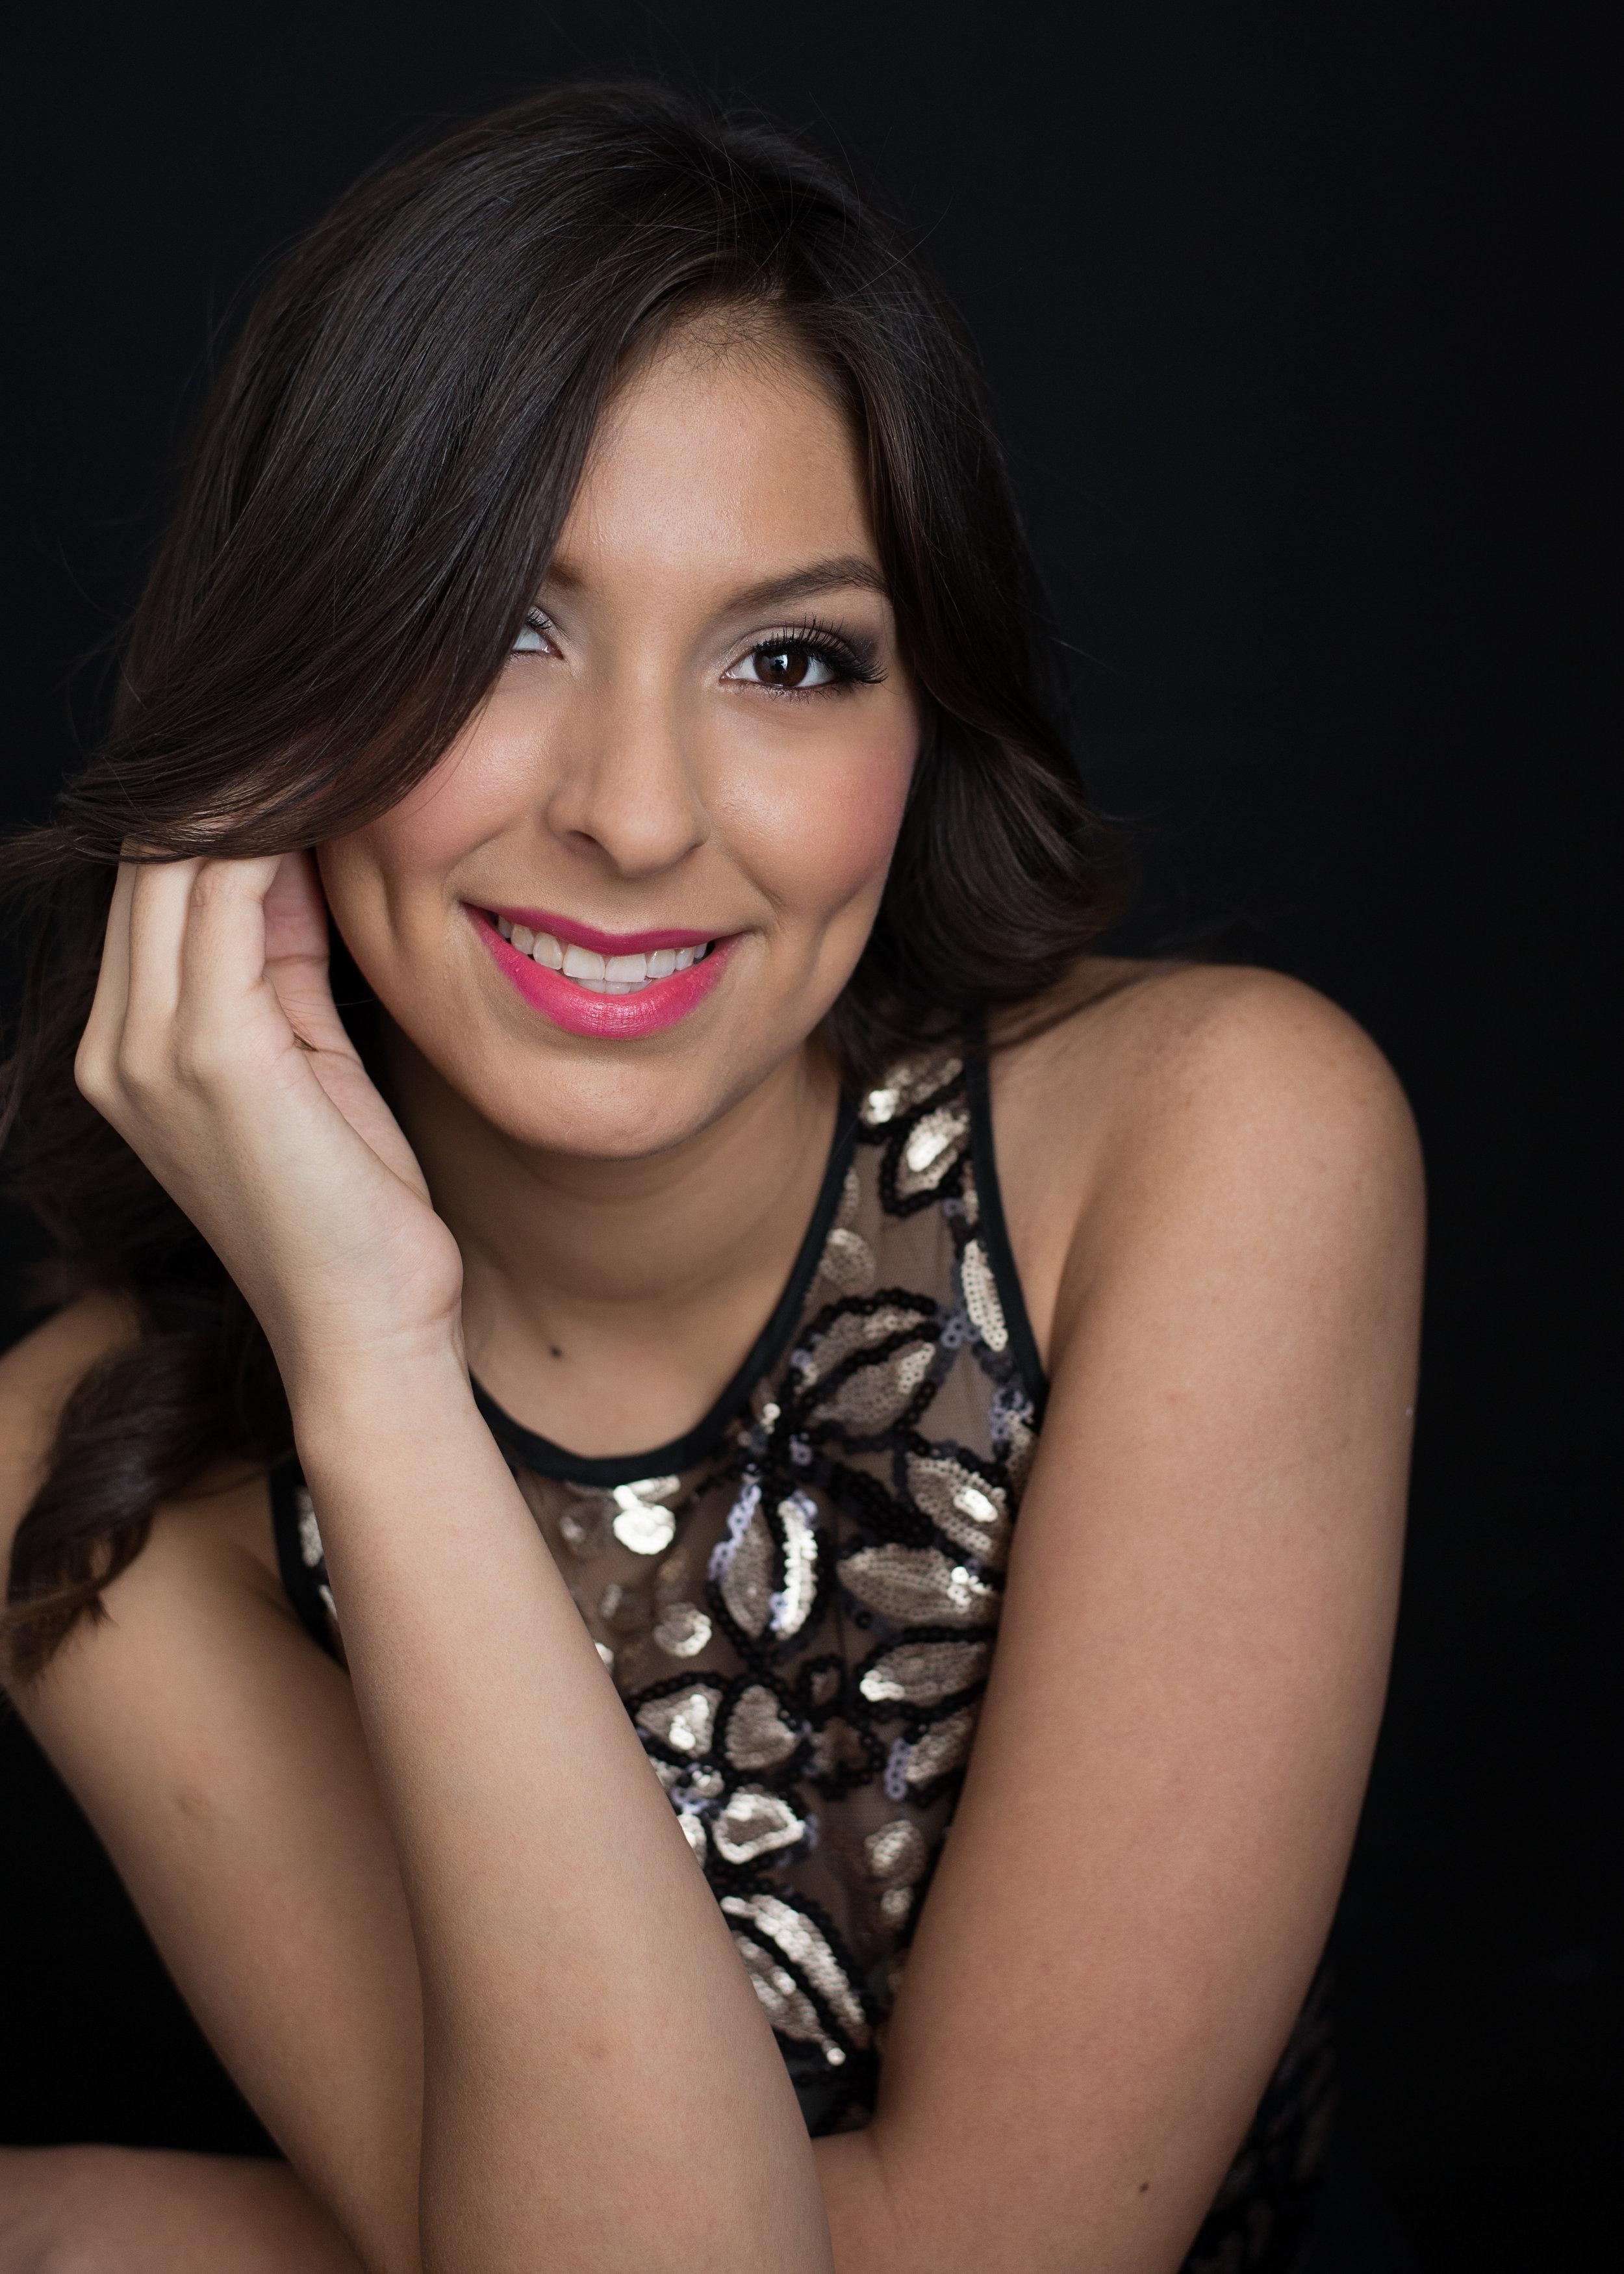 Melissa-Alcantar-Fotografia-Sesion-fotos-mexicali-retrato-brillos-texturas-19.JPG